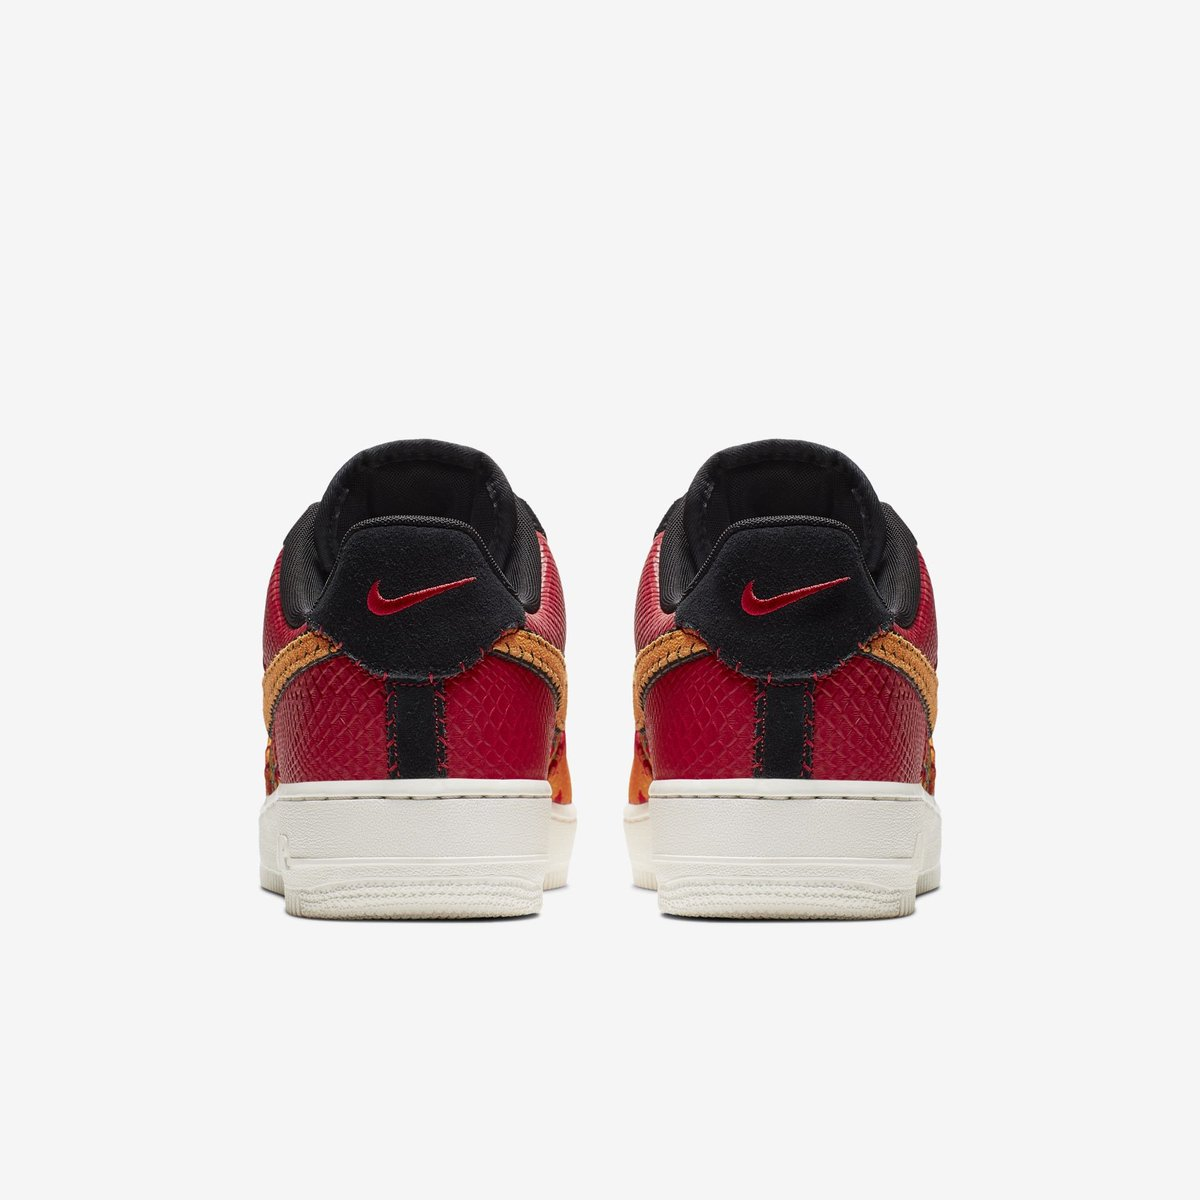 J23 iPhone App on Twitter: NEW Nike Air Max 97 Premium